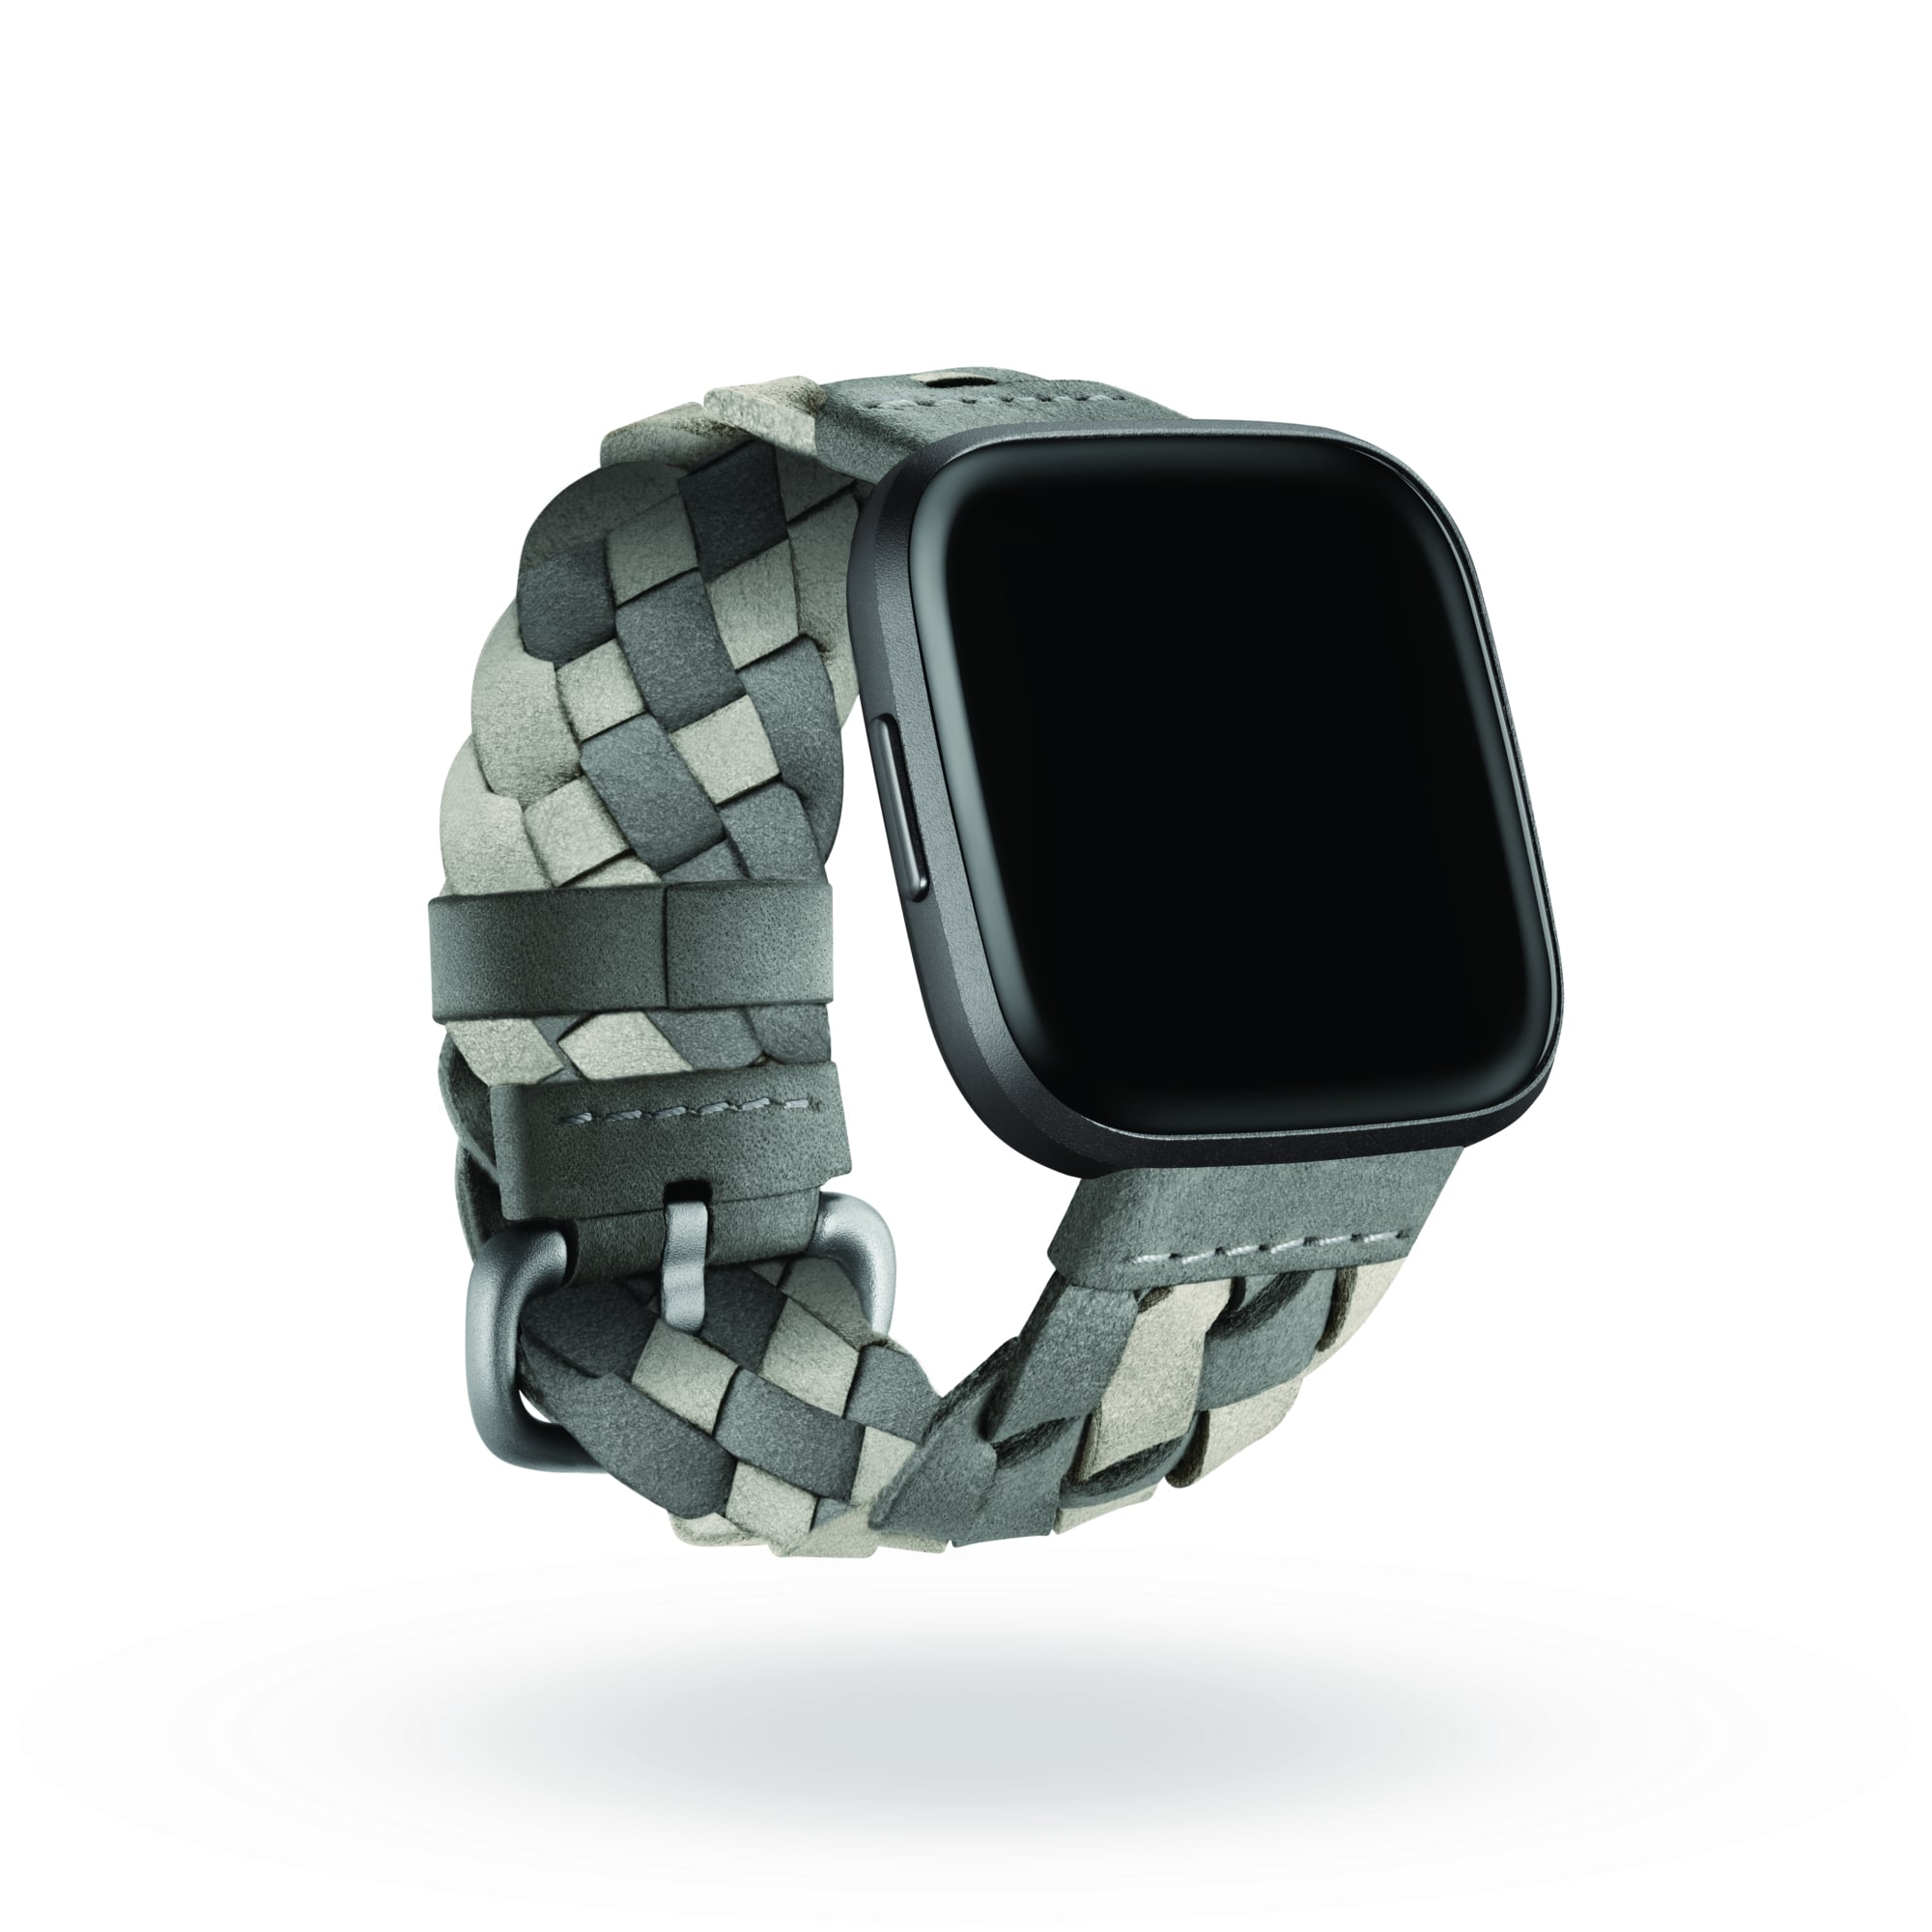 Fitbit x Kim Shui braided suede bracelet in Grey/Mist